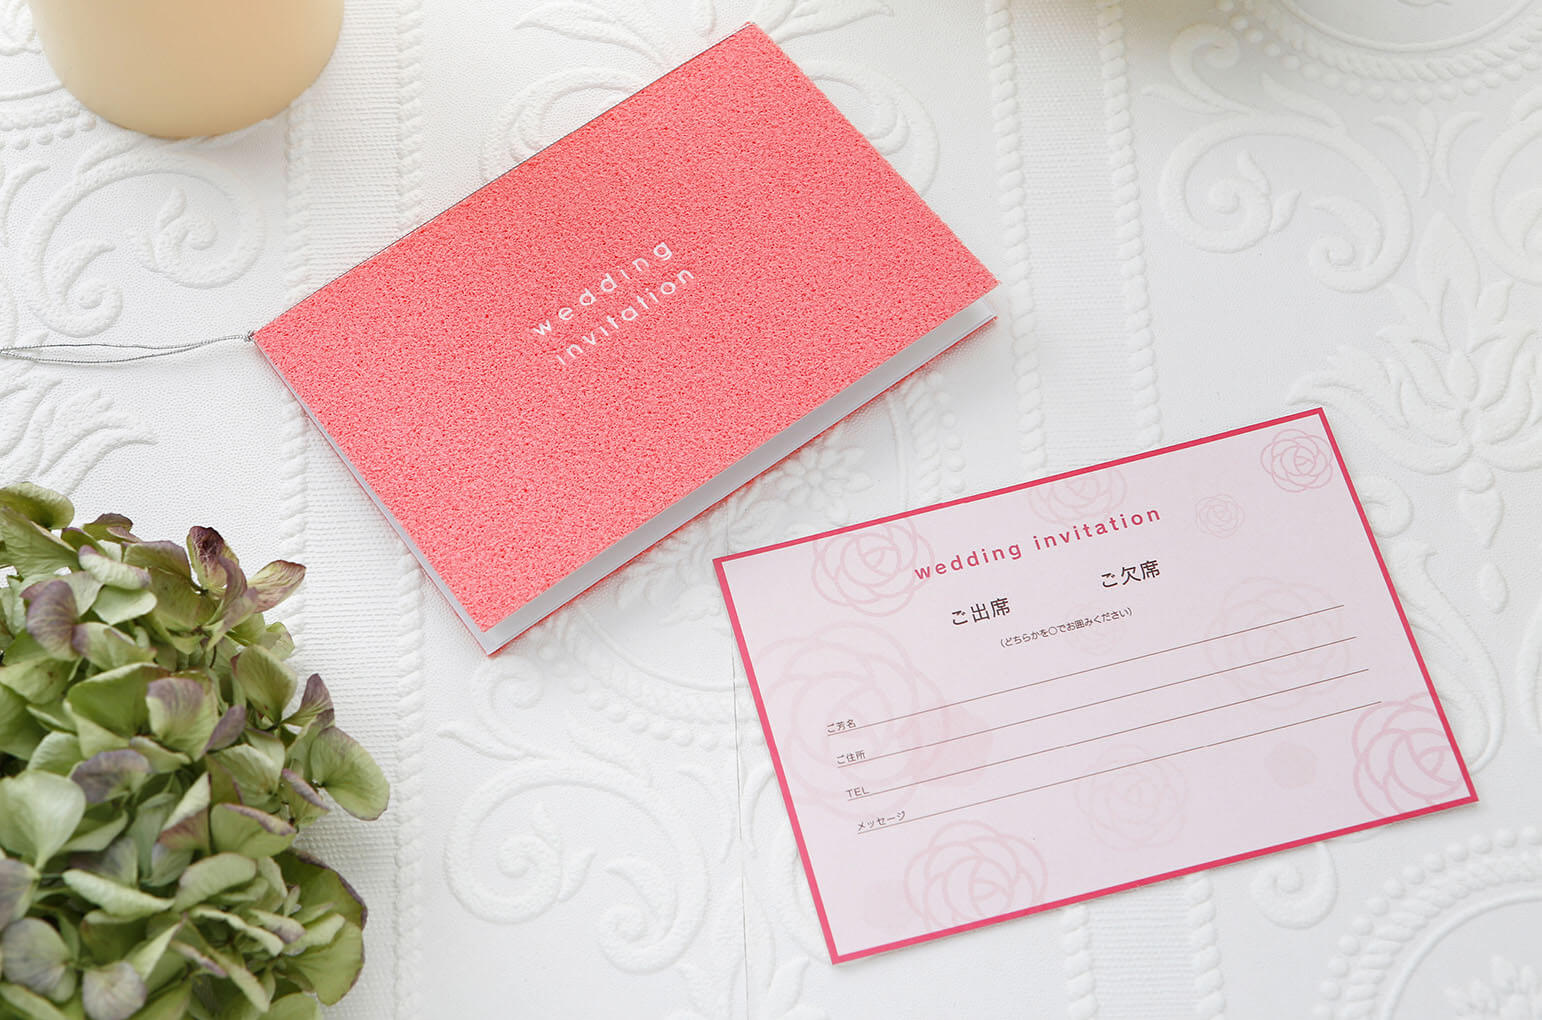 df9e31a9aaca3 いつまでも触っていたくなる結婚式招待状ですので、一度サンプル請求をして実際に手に取ってみてくださいね。